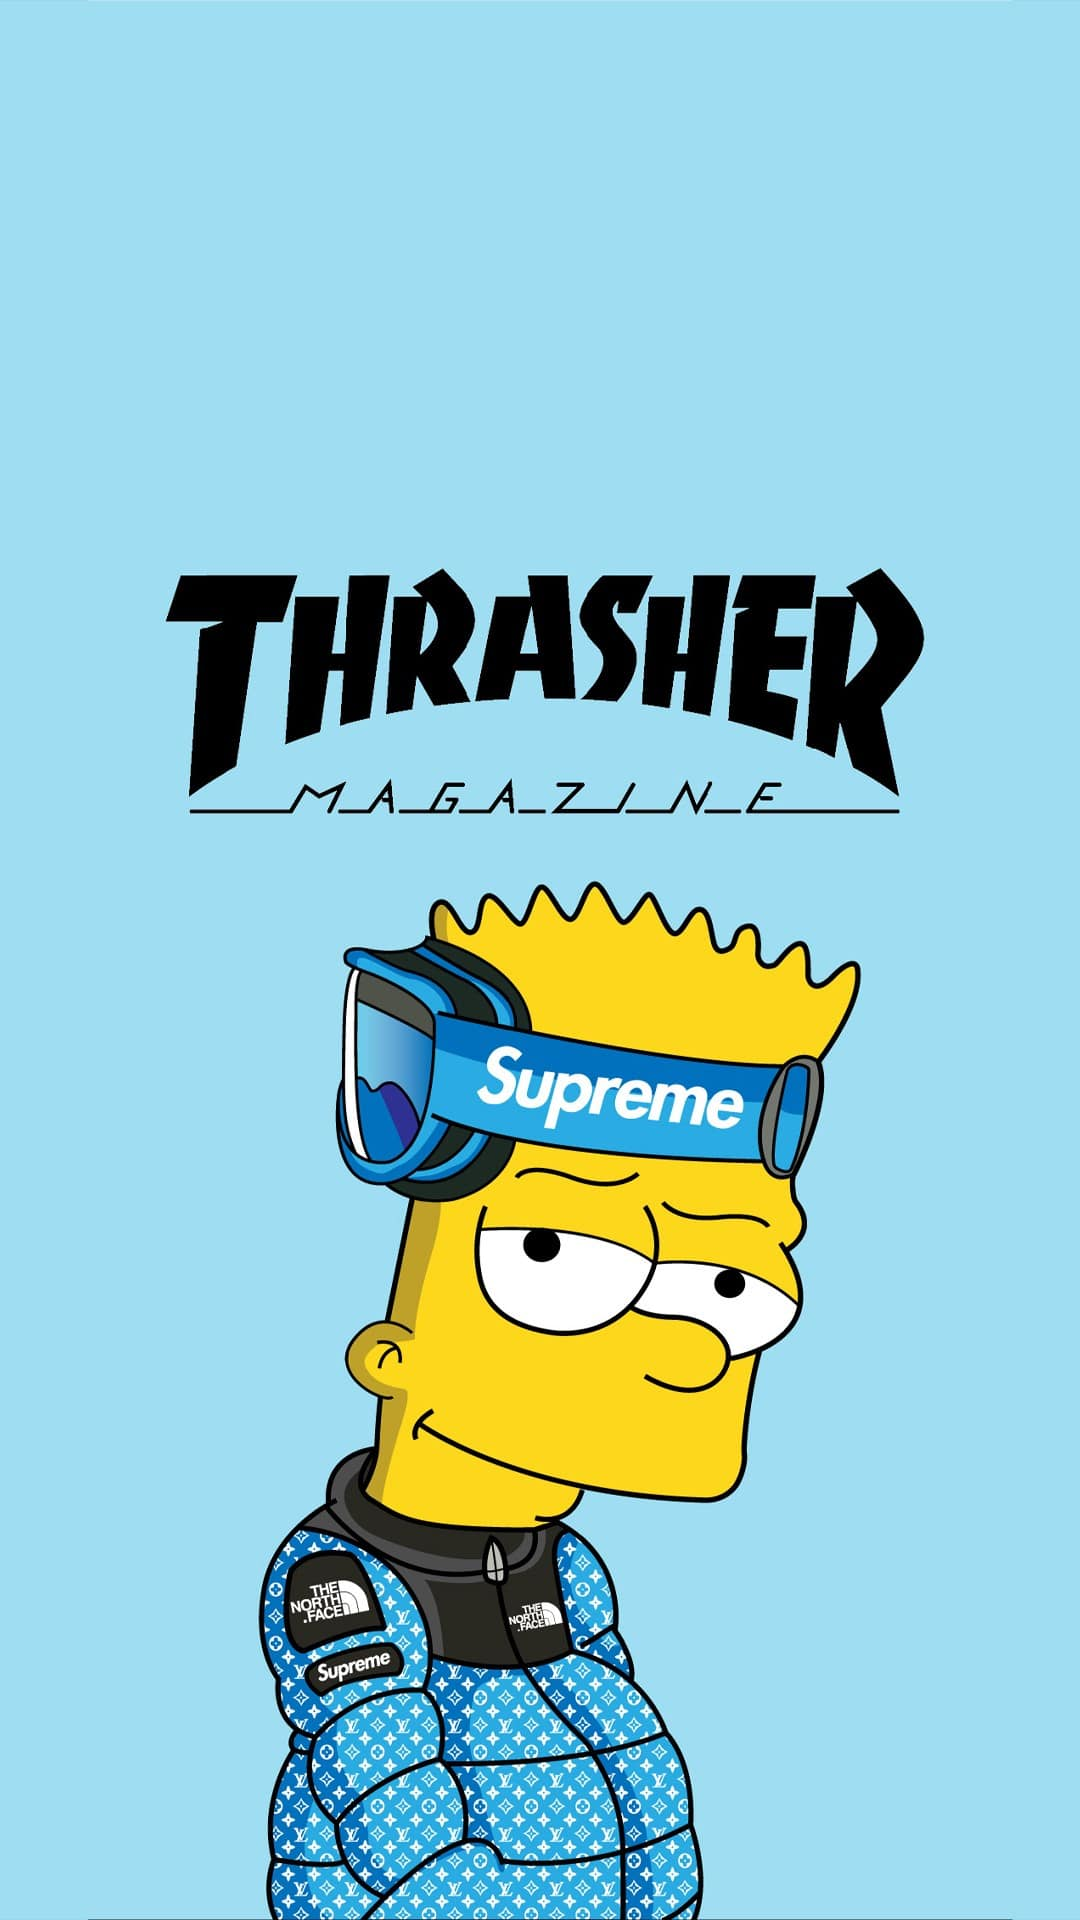 Supreme Bart Simpson Wallpaper - KoLPaPer - Awesome Free ...